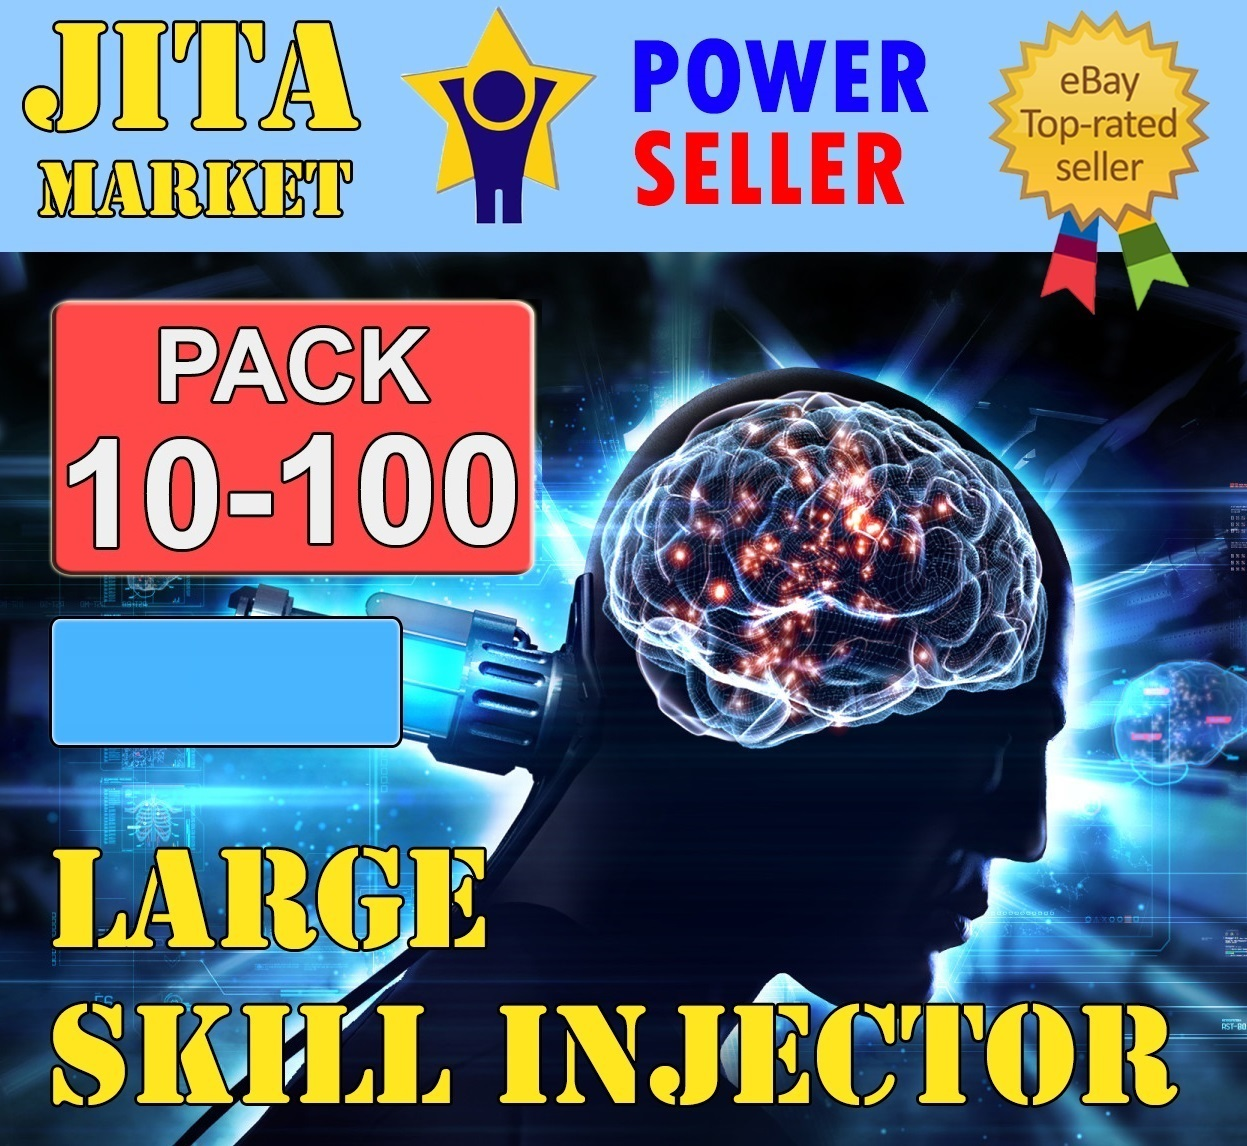 JitaMarket = Large Skill Injector = Minimum Order x10 = Extremely Fast = Maximum Safe =